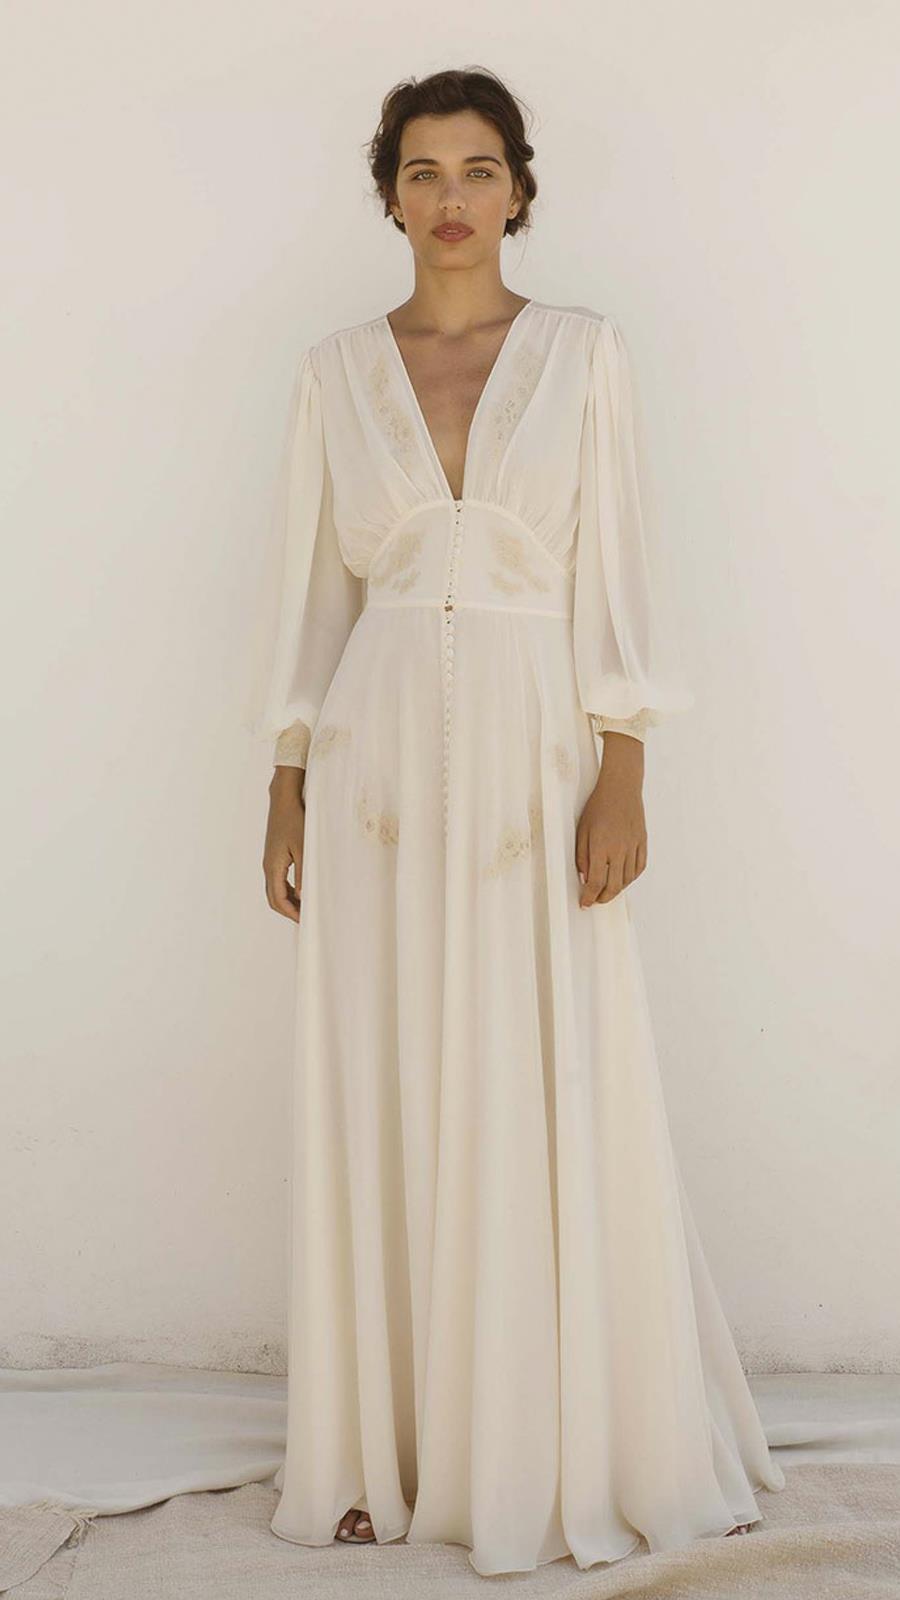 Comprar traje novia online